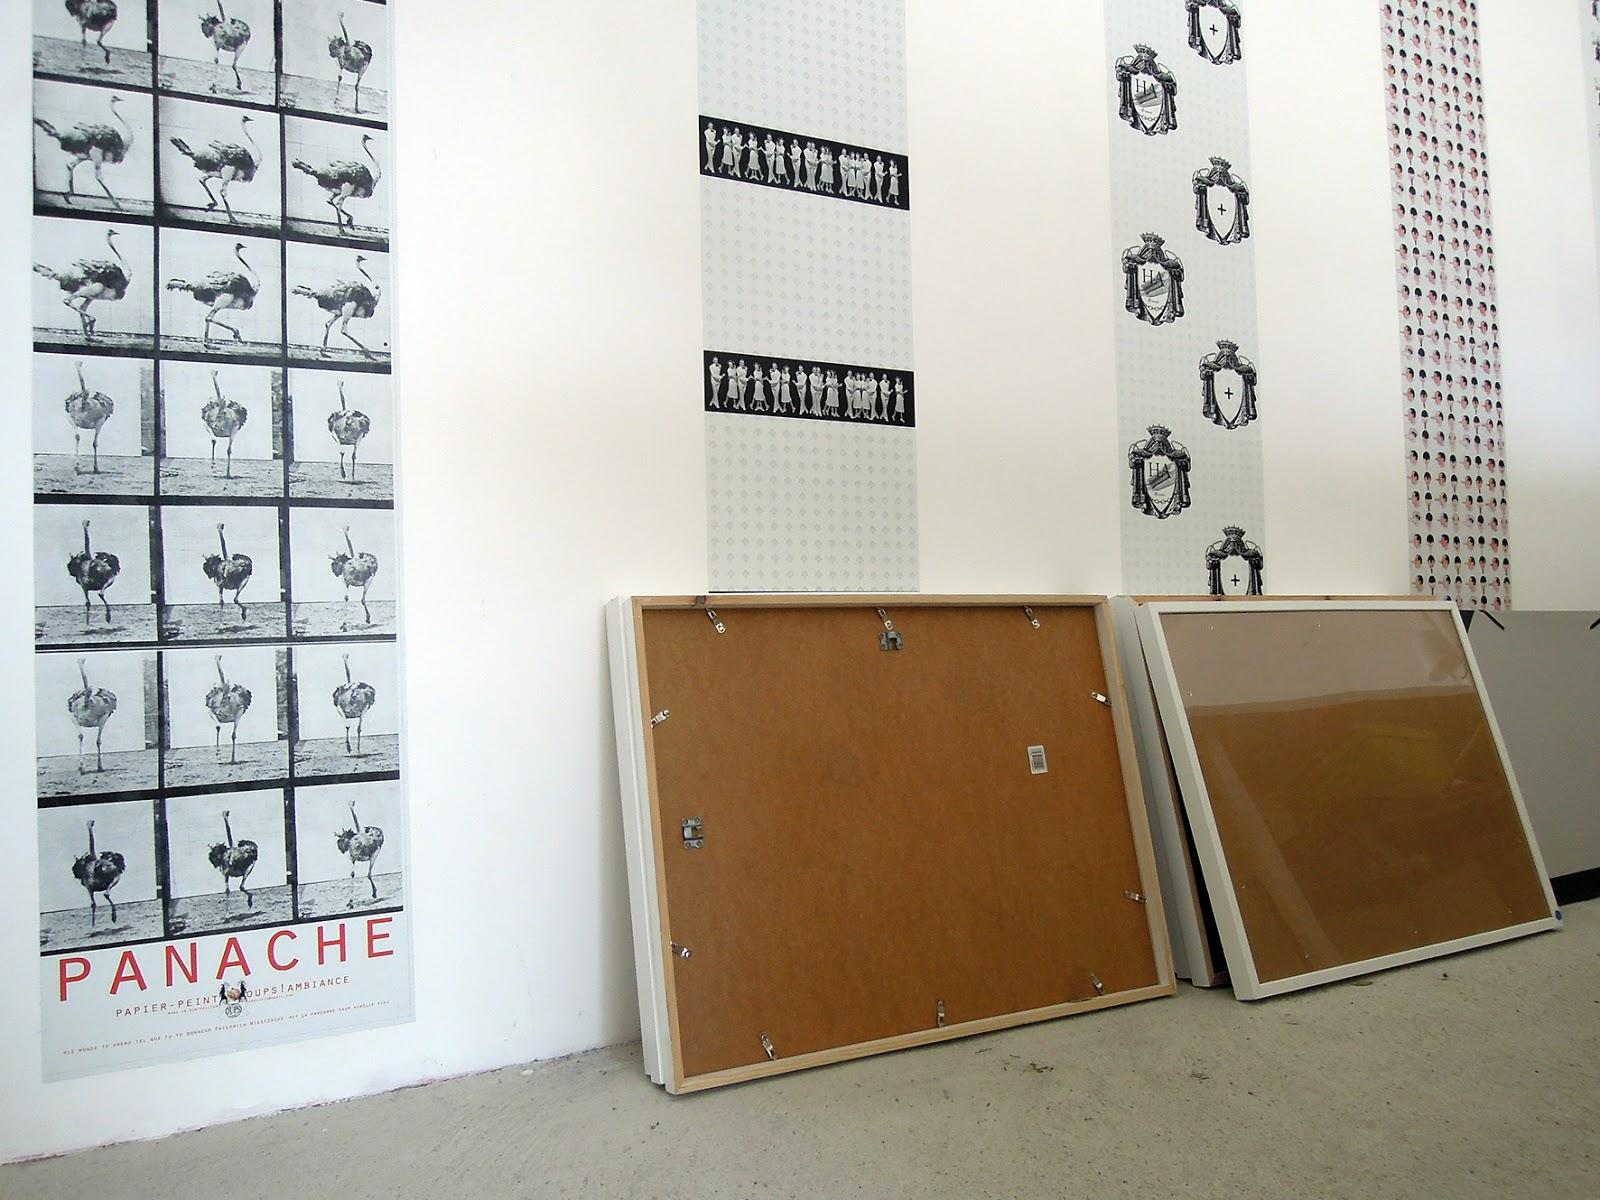 Impression Photo Papier Peint - Impression photo sur tapisserie posterXXL